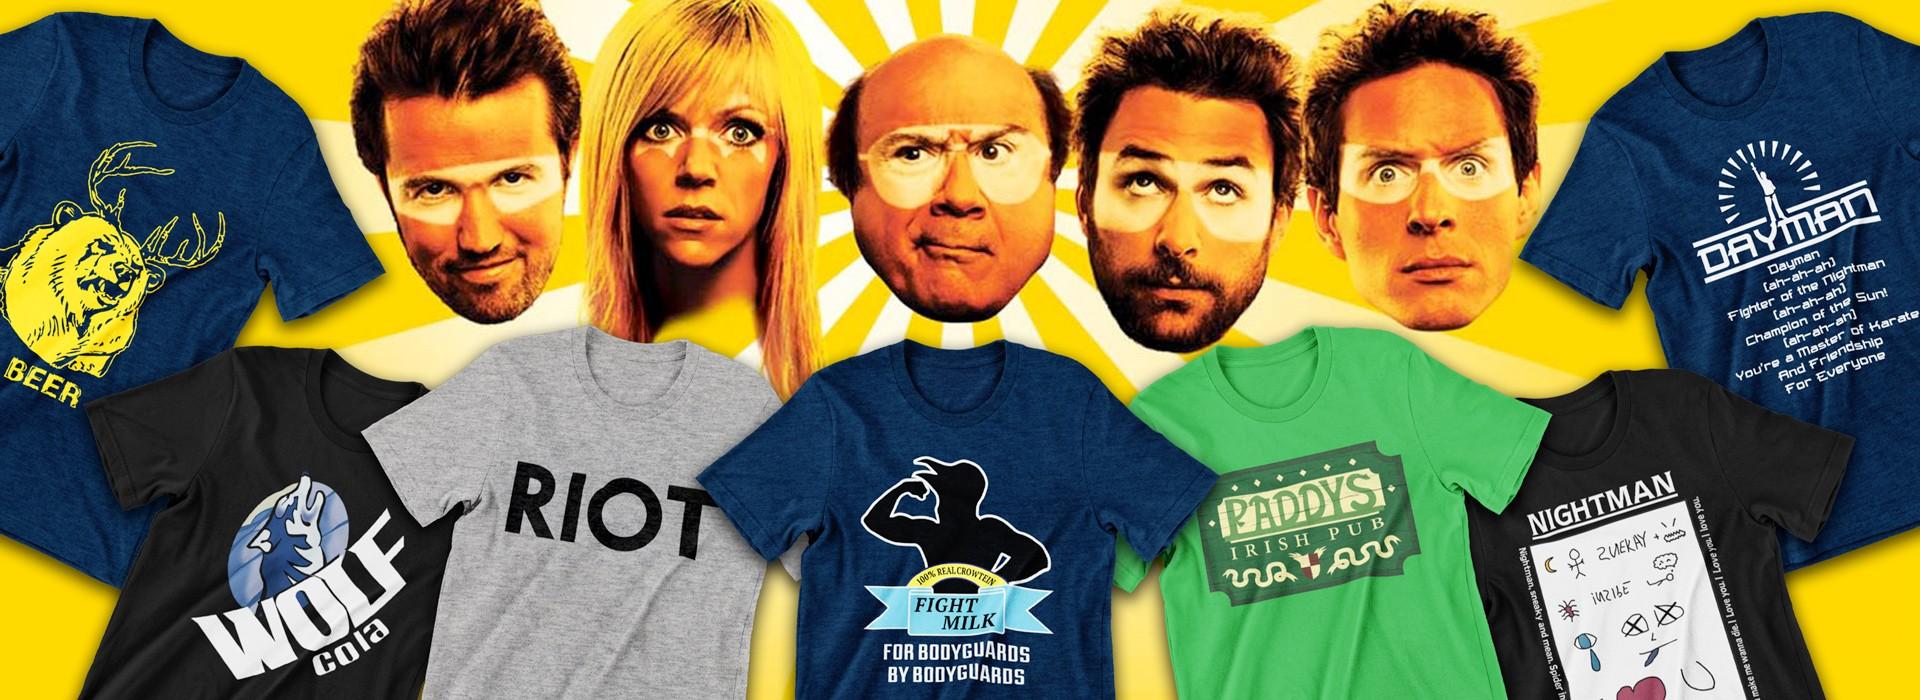 It's Always Sunny In Philadelphia T-Shirts